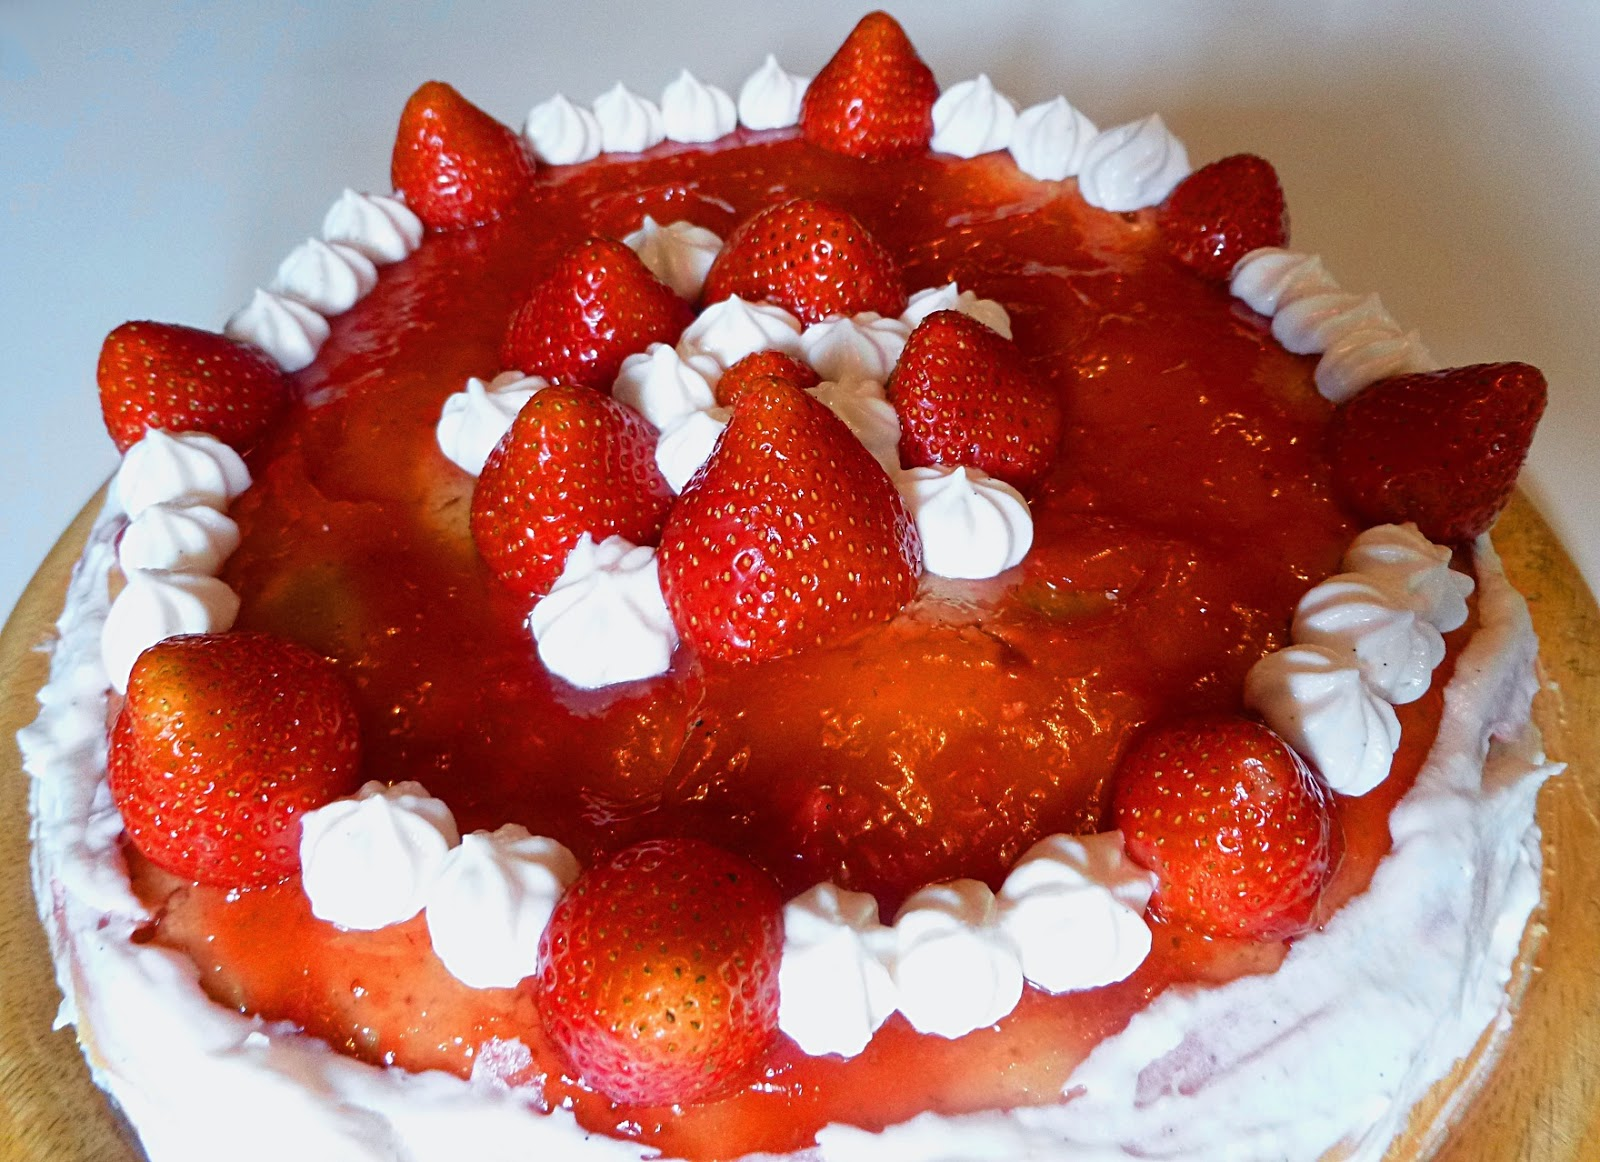 http://frlflauschmiez.blogspot.de/2014/09/erbeer-mousse-au-chocolat-torte.html